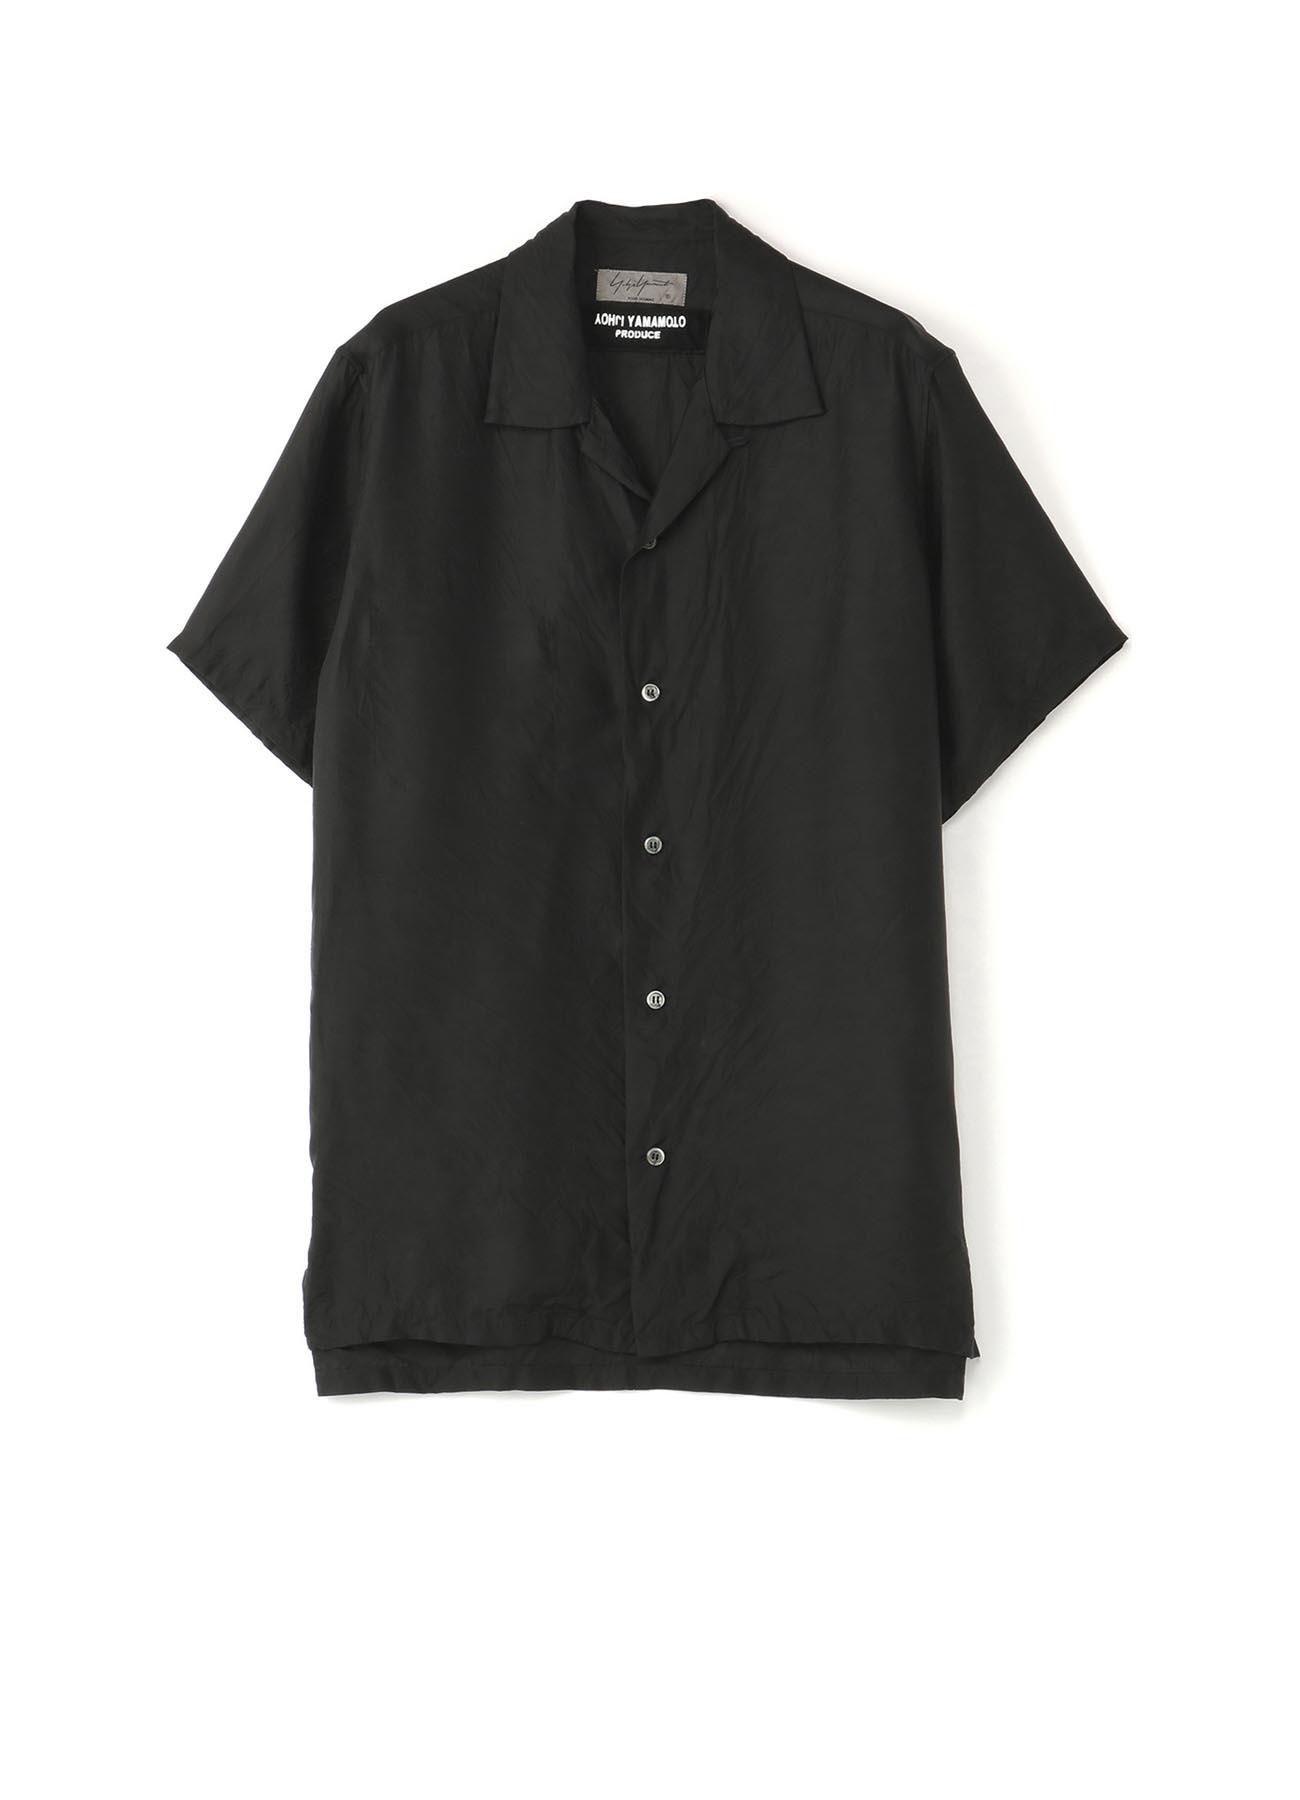 【THE SHOP限定】西装领衬衫